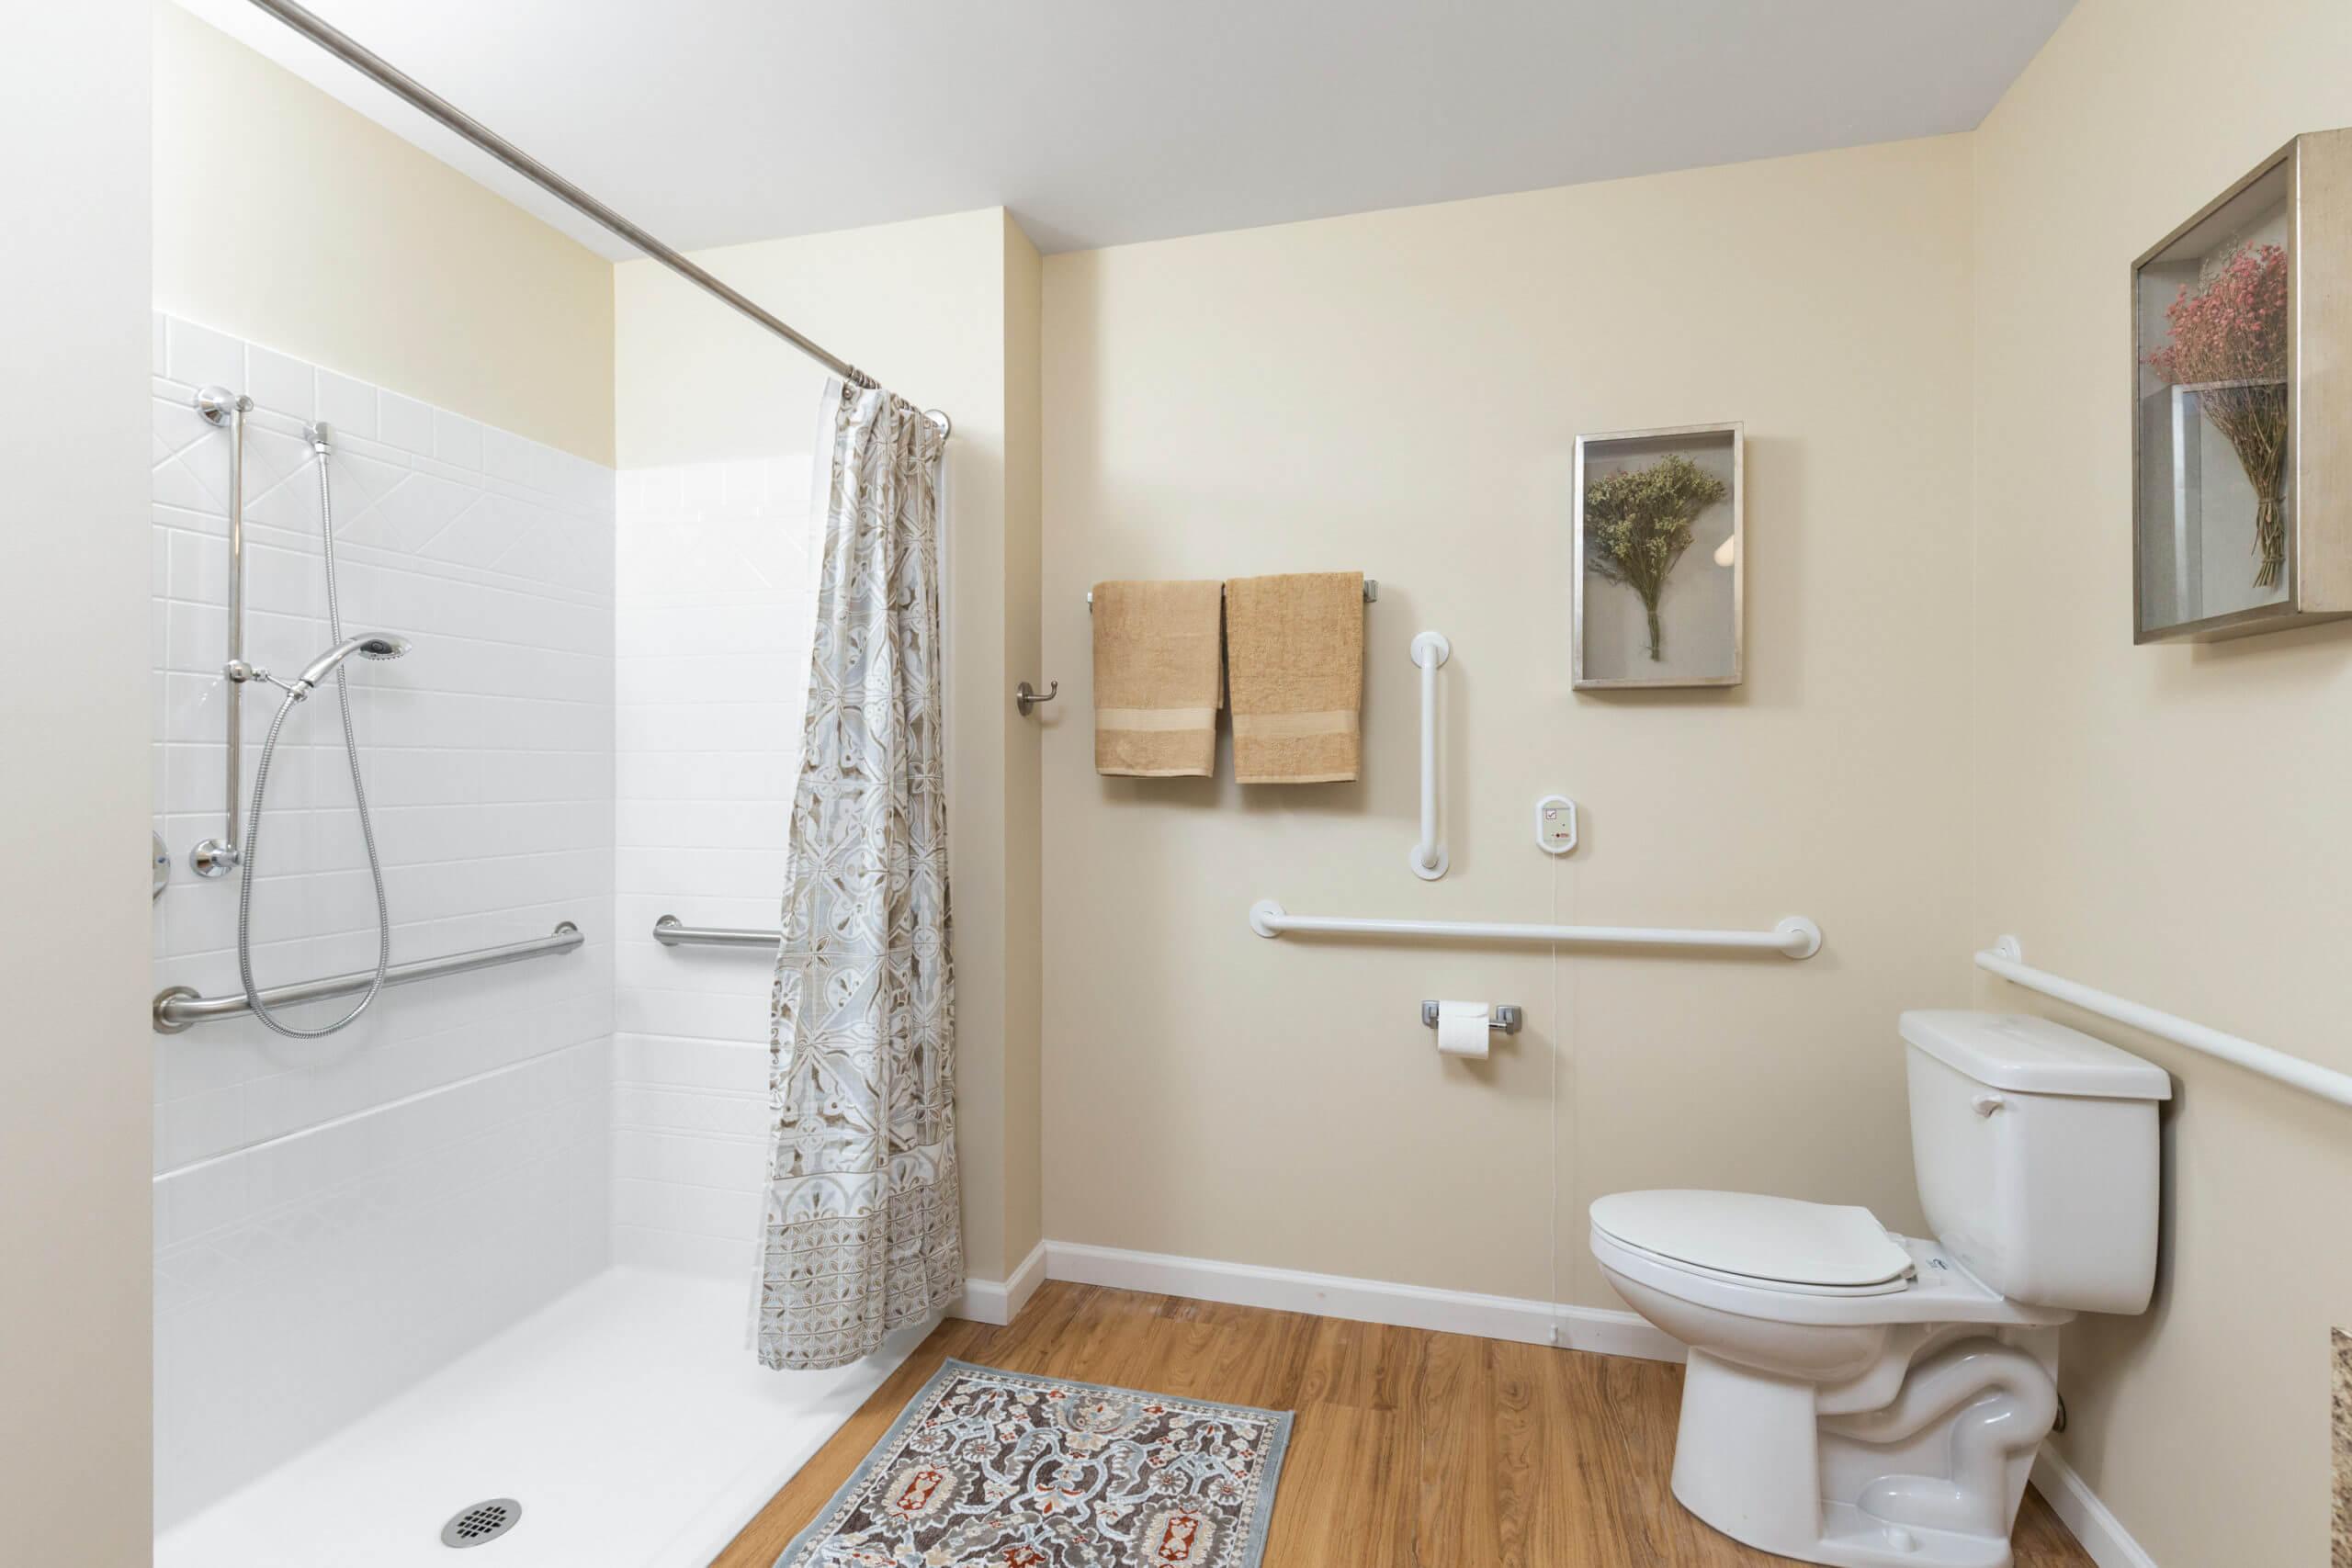 Baxter Senior Living Assisted Living Studio Bathroom